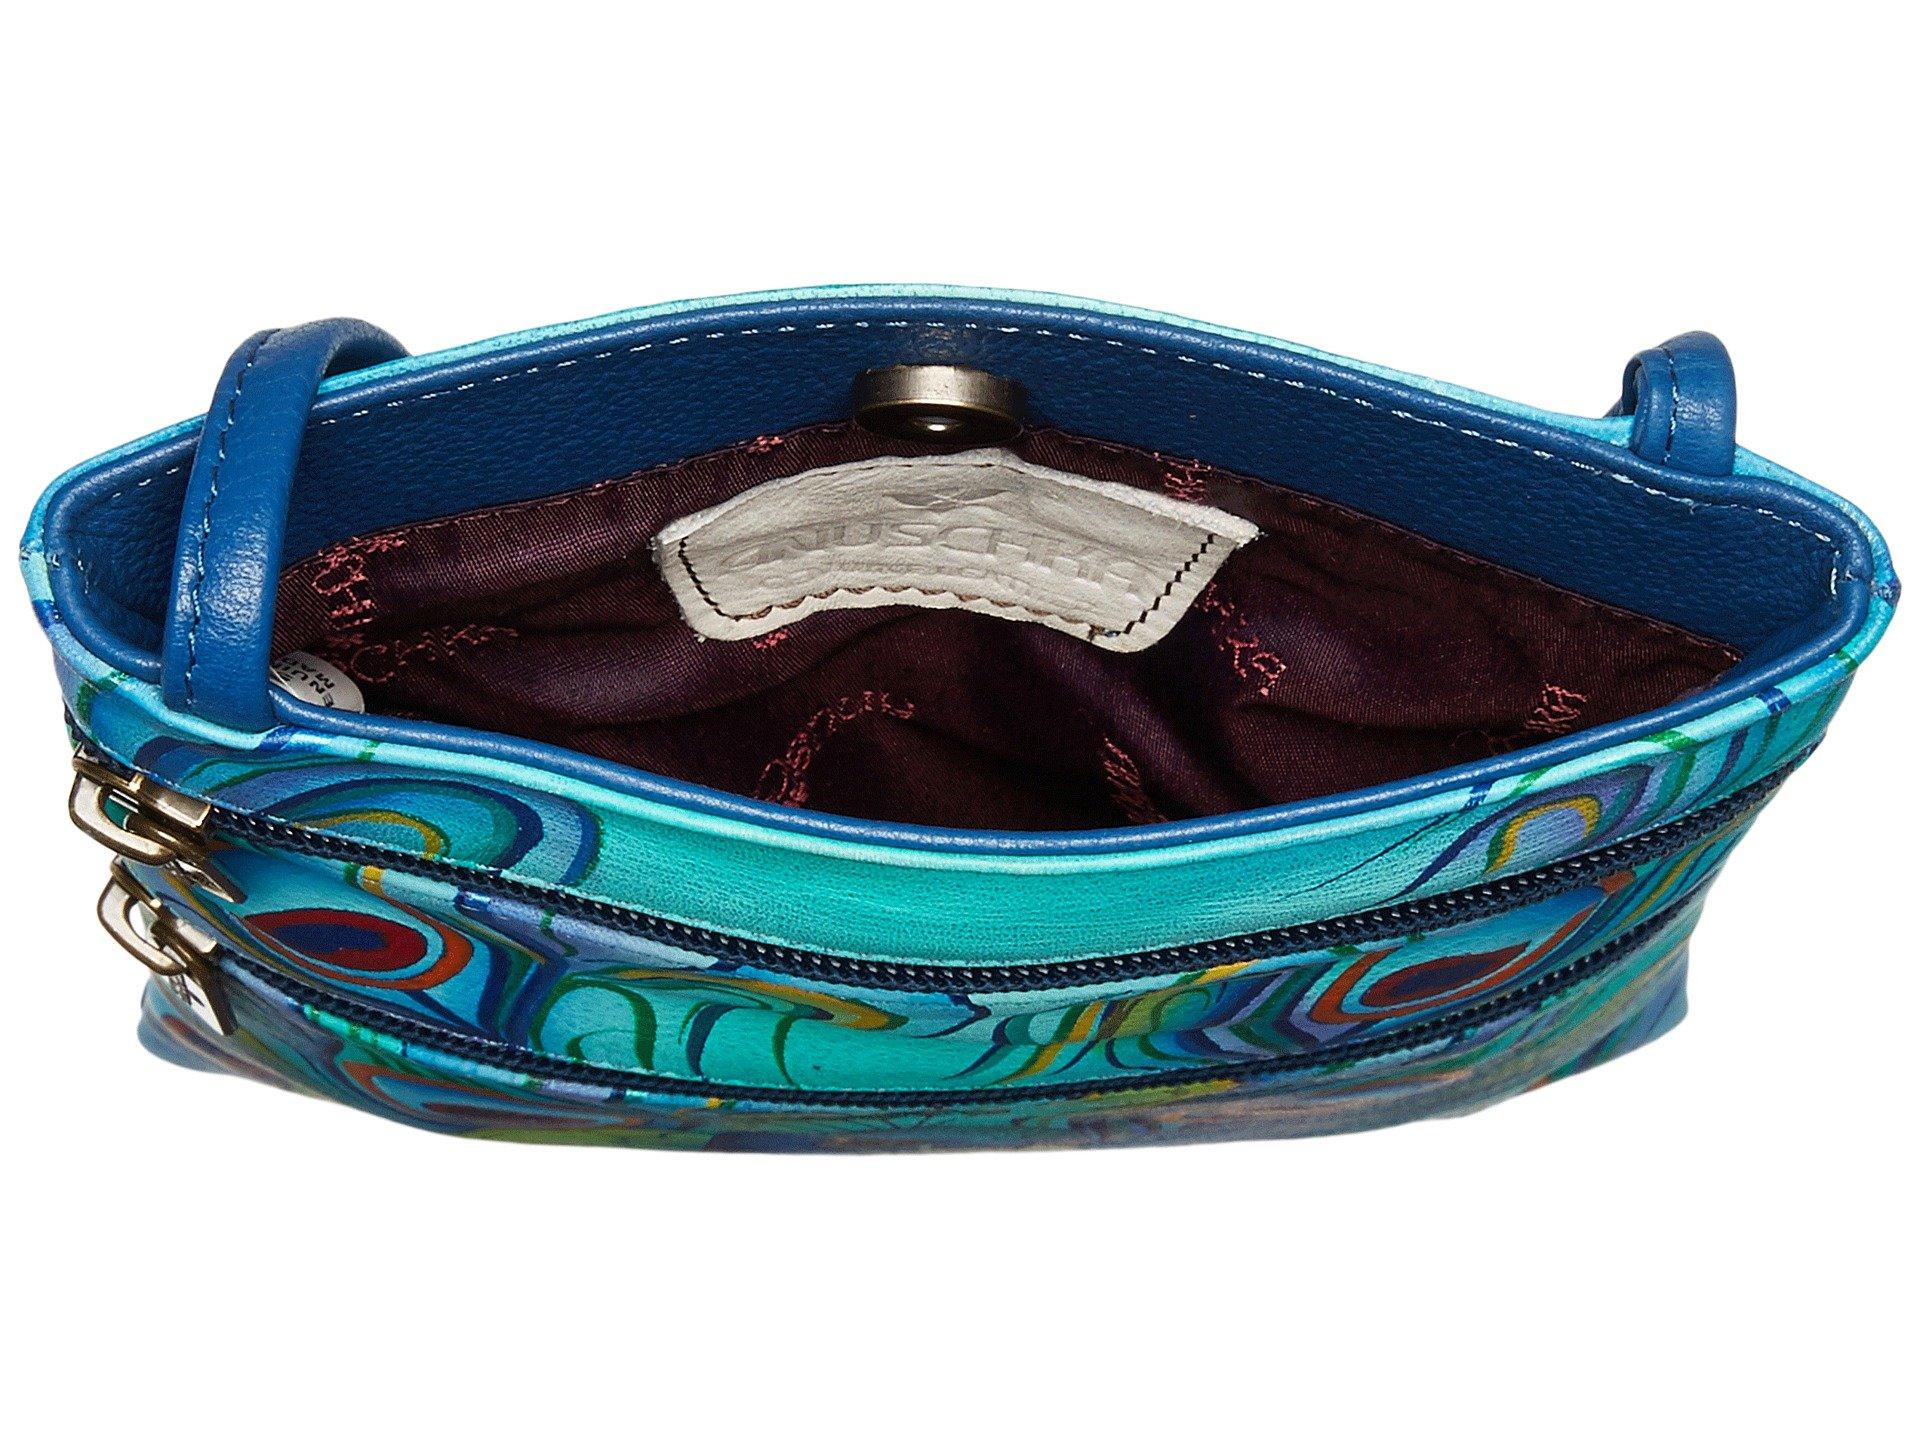 Jewelled Handbags Mini Travel Plume Double Zip Anuschka 448 Crossbody xaqRWdnw0U